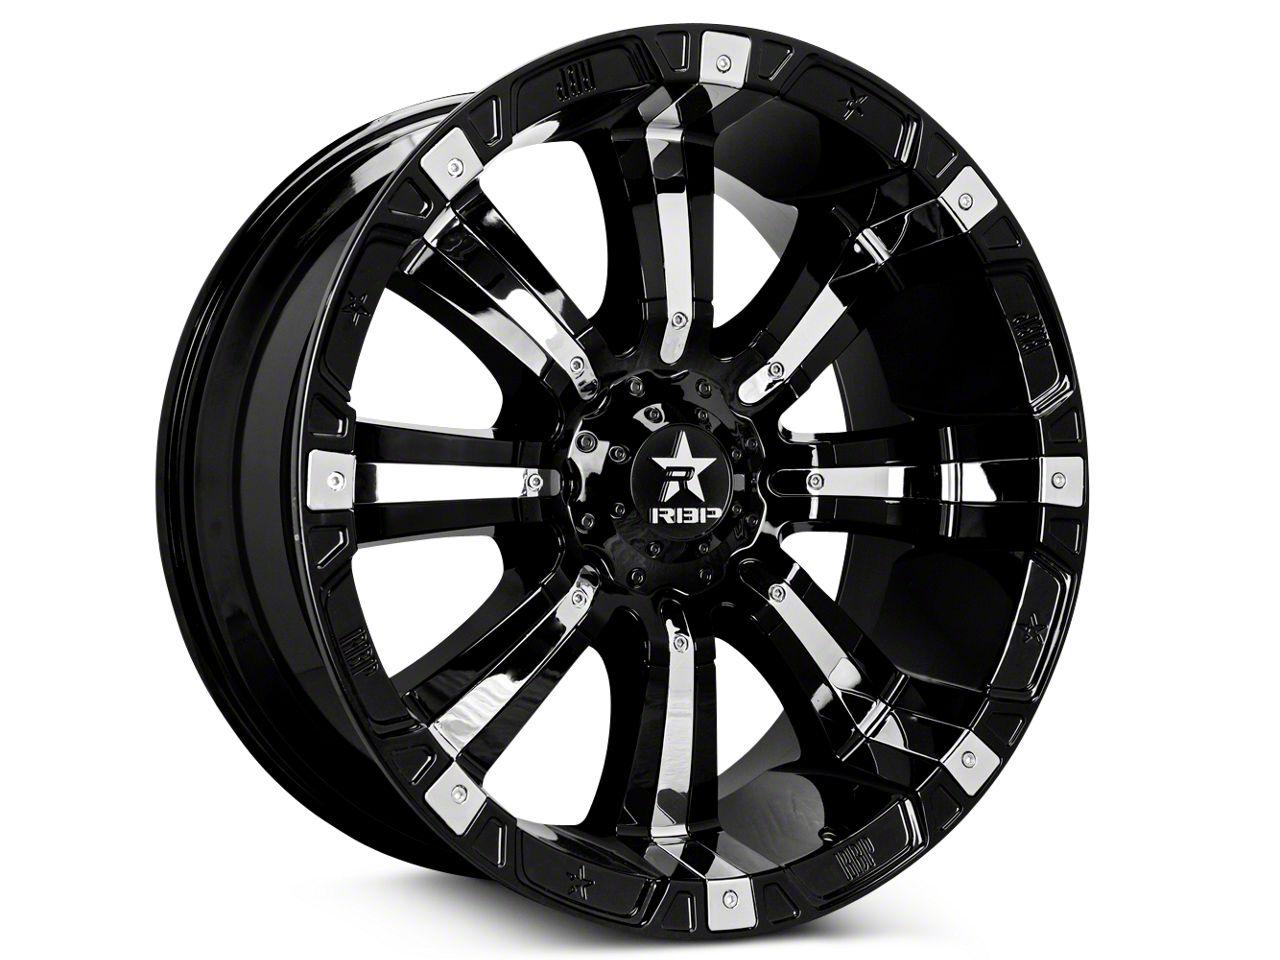 RBP 94R Black w/ Chrome Inserts 5-Lug Wheel - 20x10 (02-18 RAM 1500, Excluding Mega Cab)